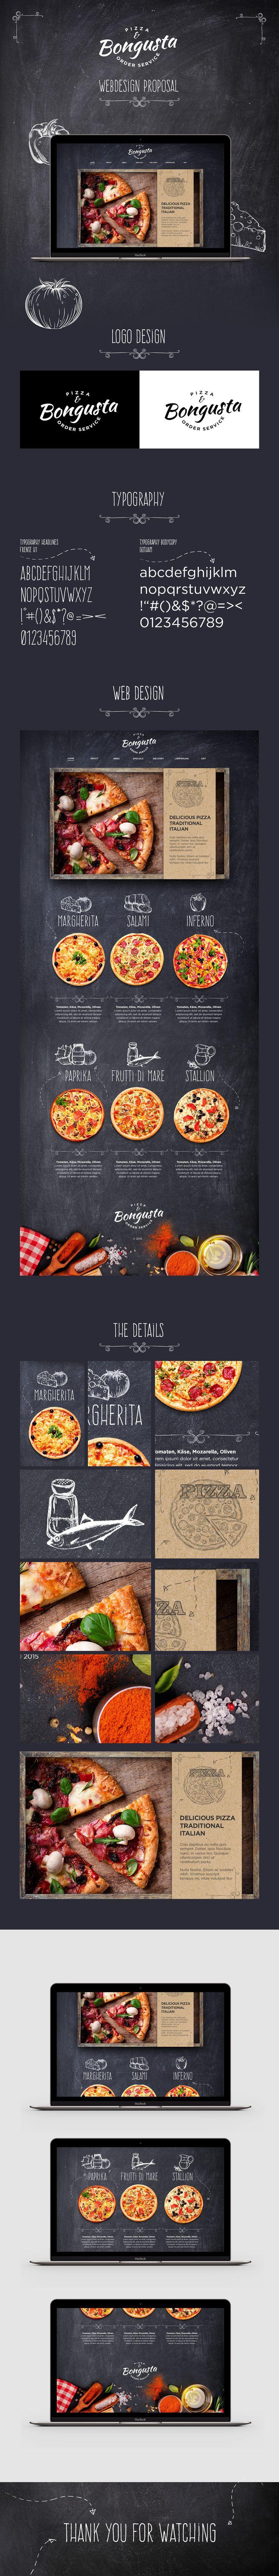 Bongusta Pizzeria u2022 Webdesign Proposal on Behance